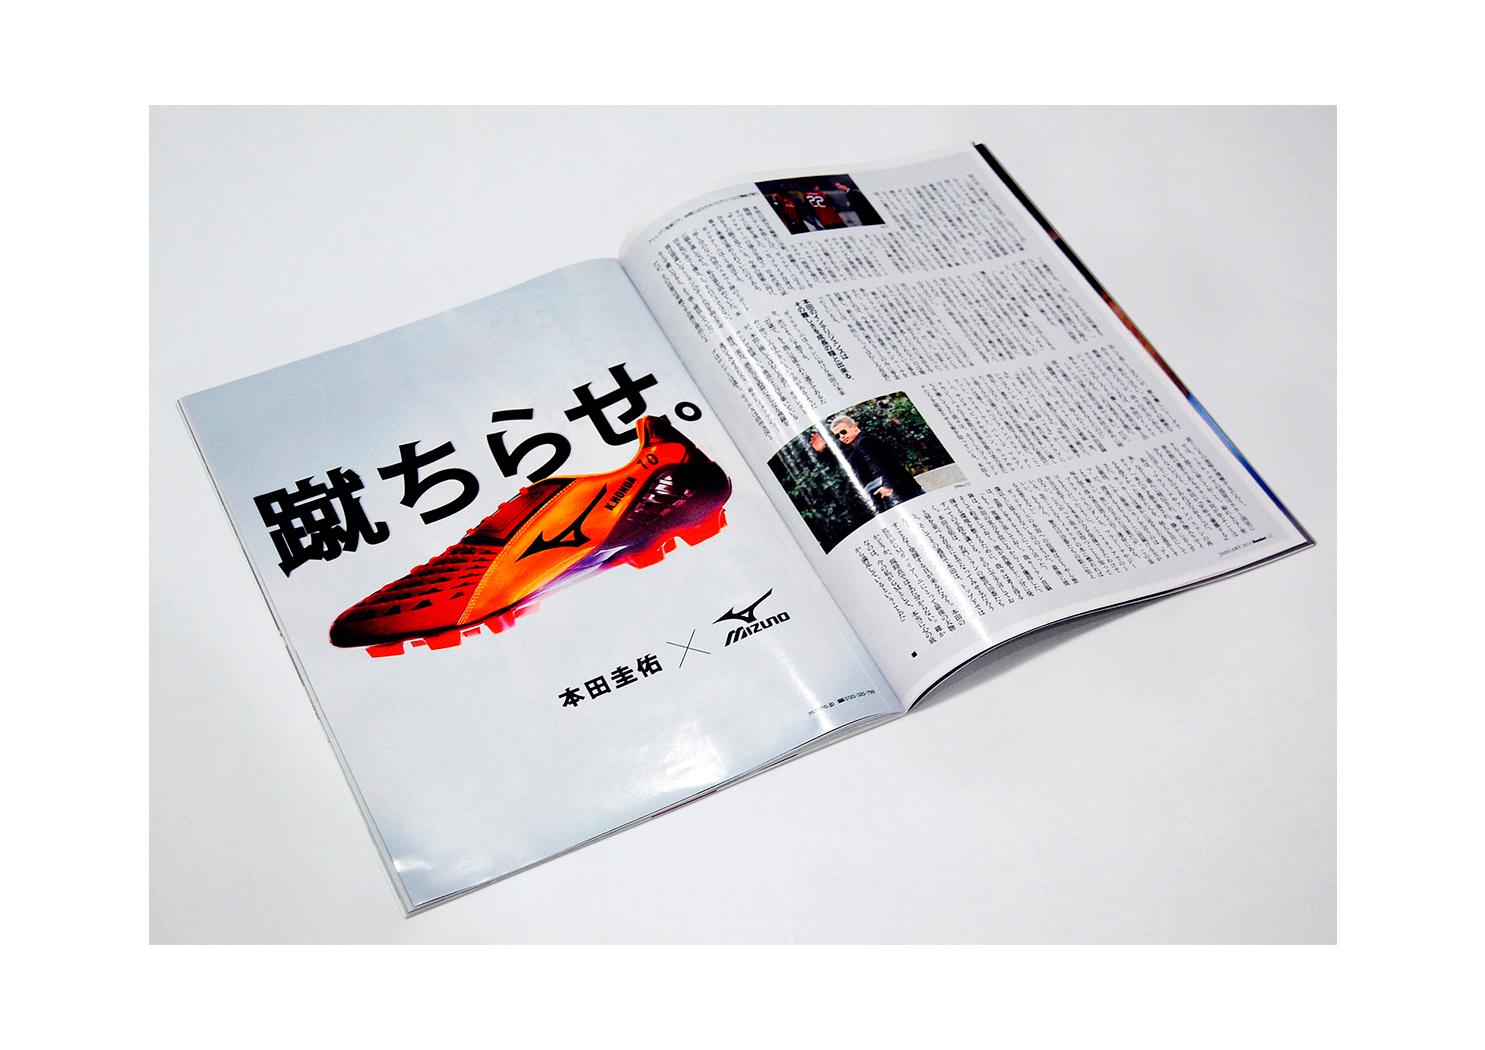 Mizuno Magazine